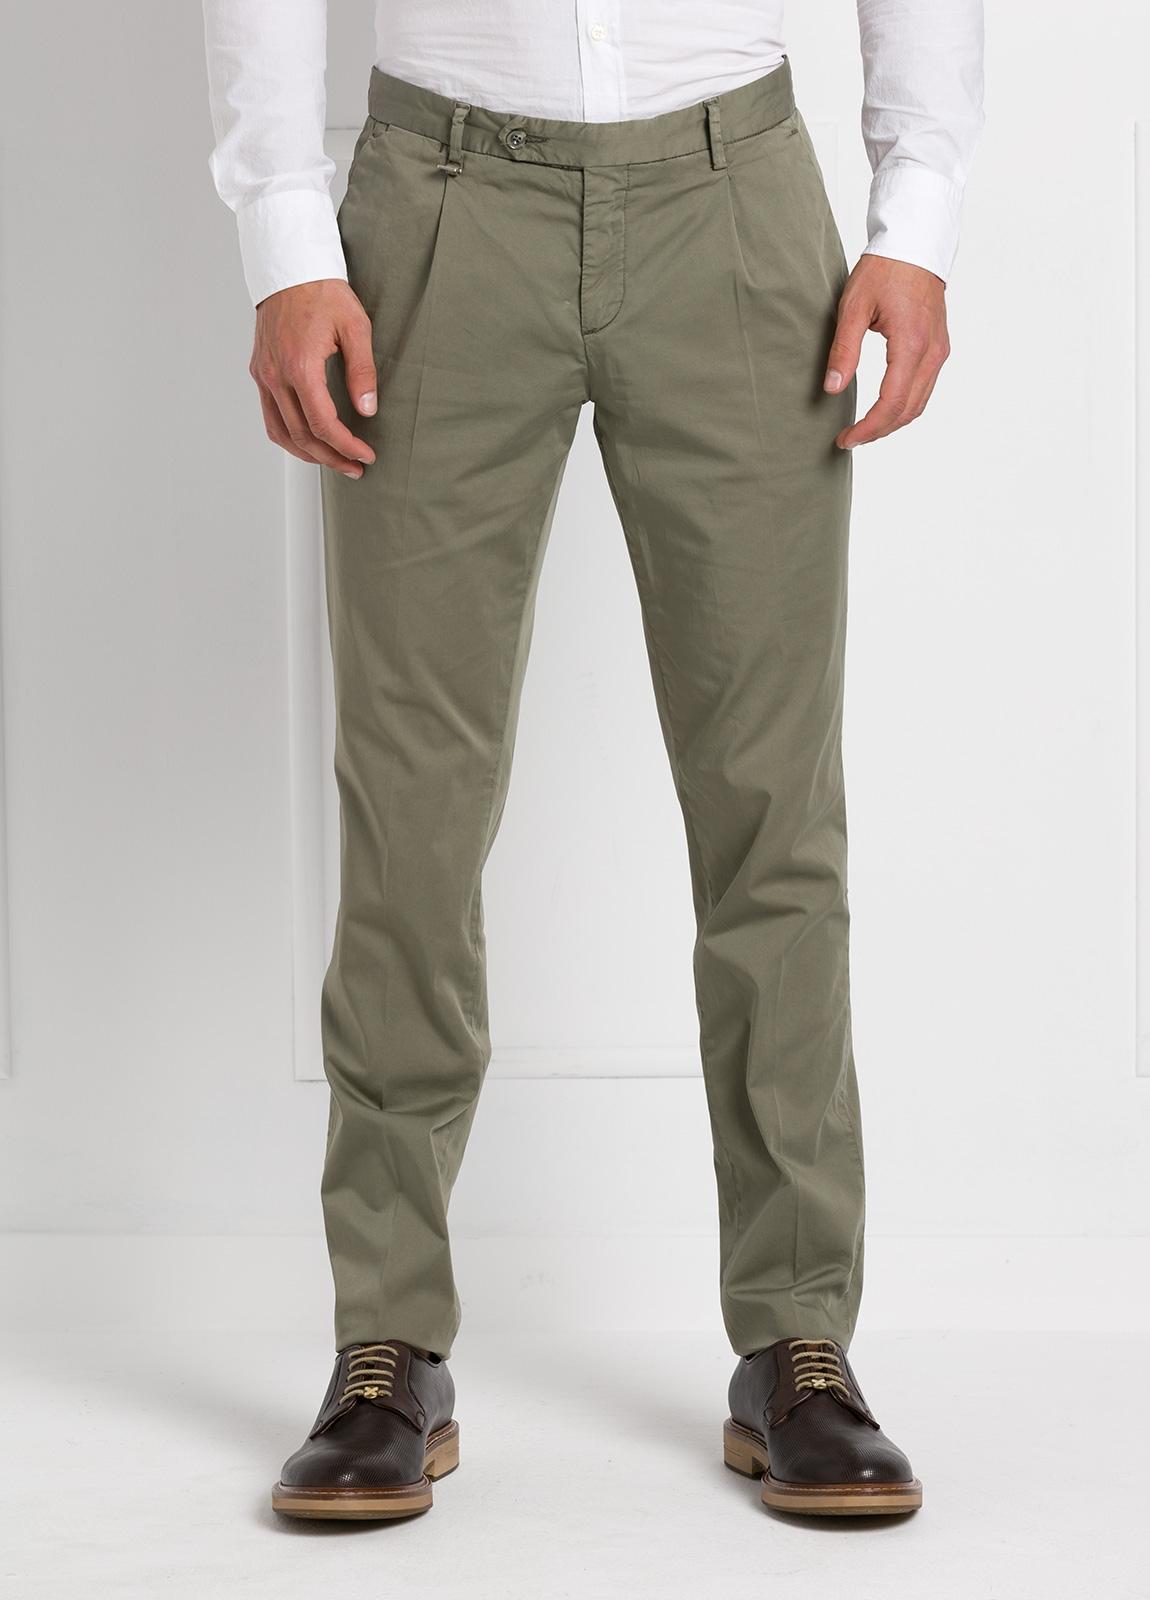 Pantalón modelo slim fit 1 pinza color kaki. 97% Algodón 3% Ea.